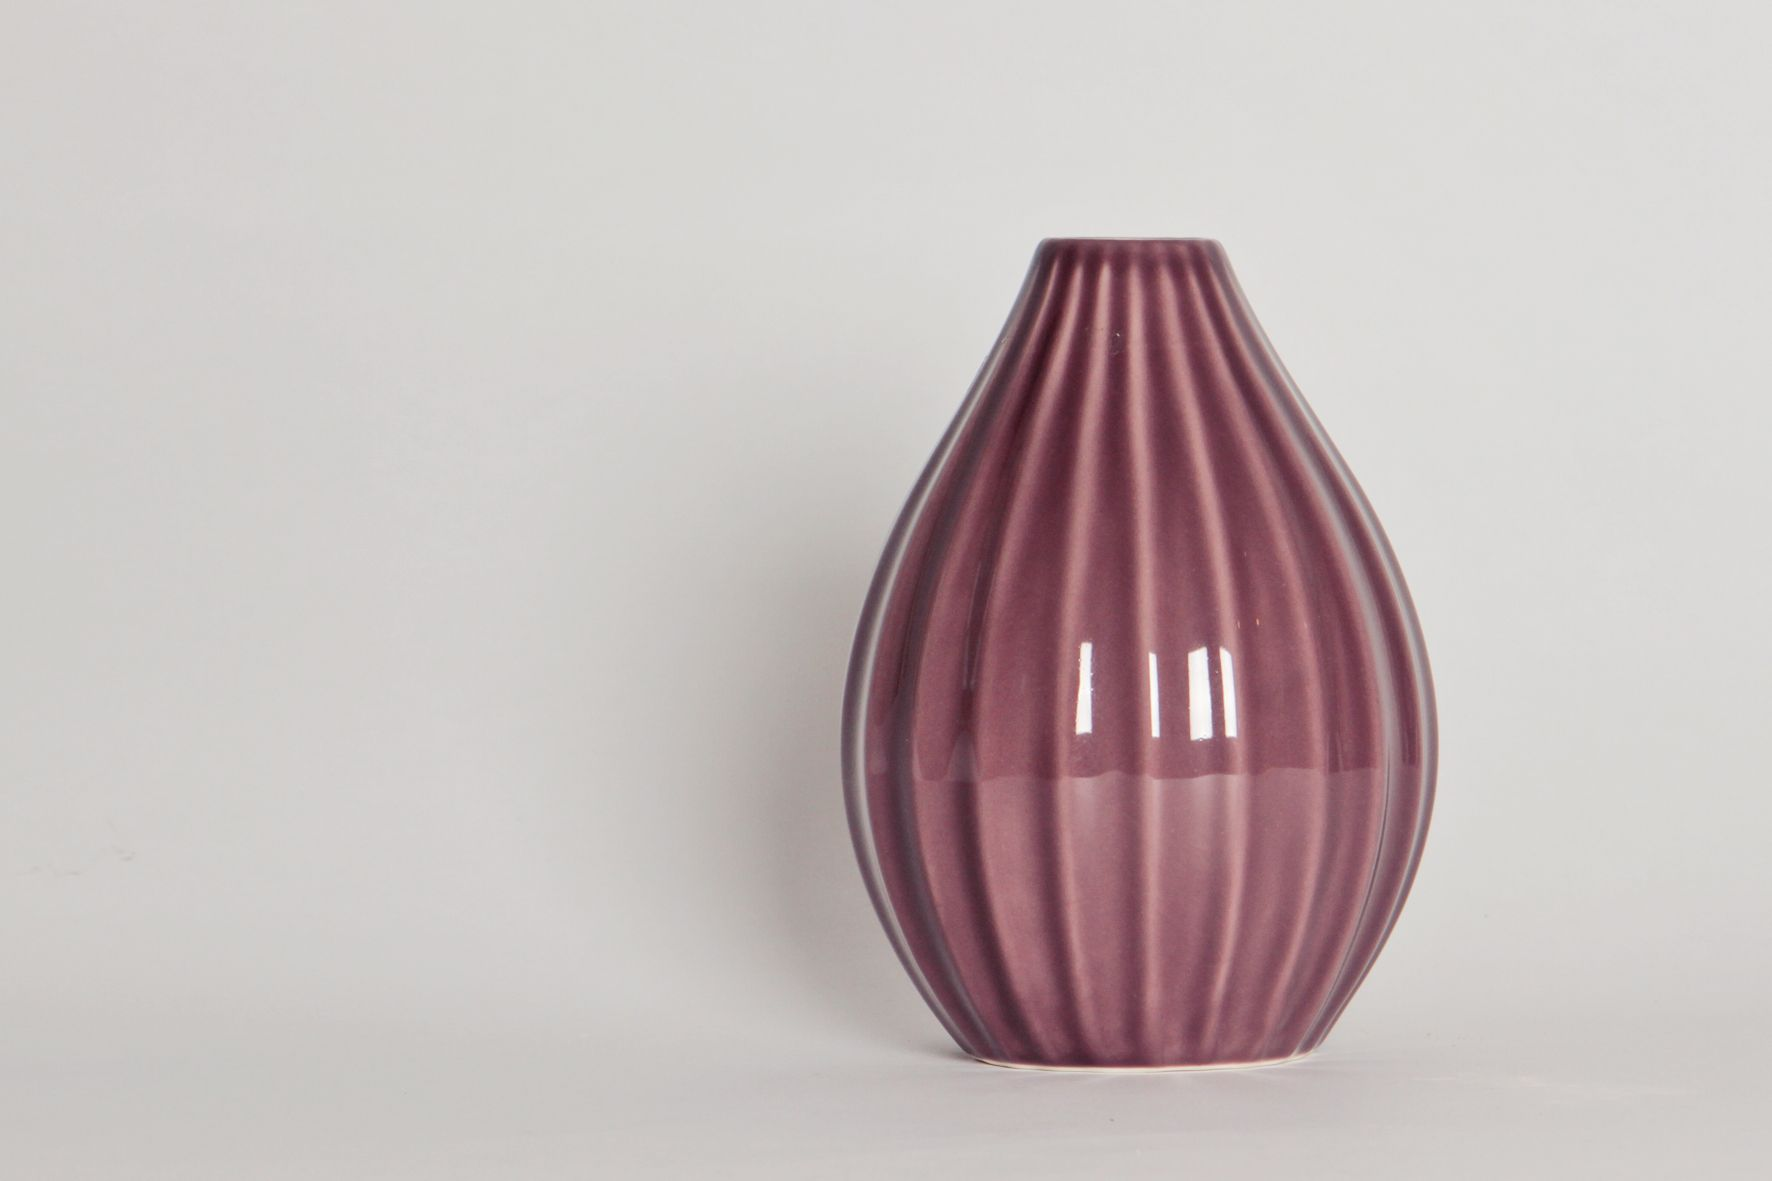 Purple tall striped vase